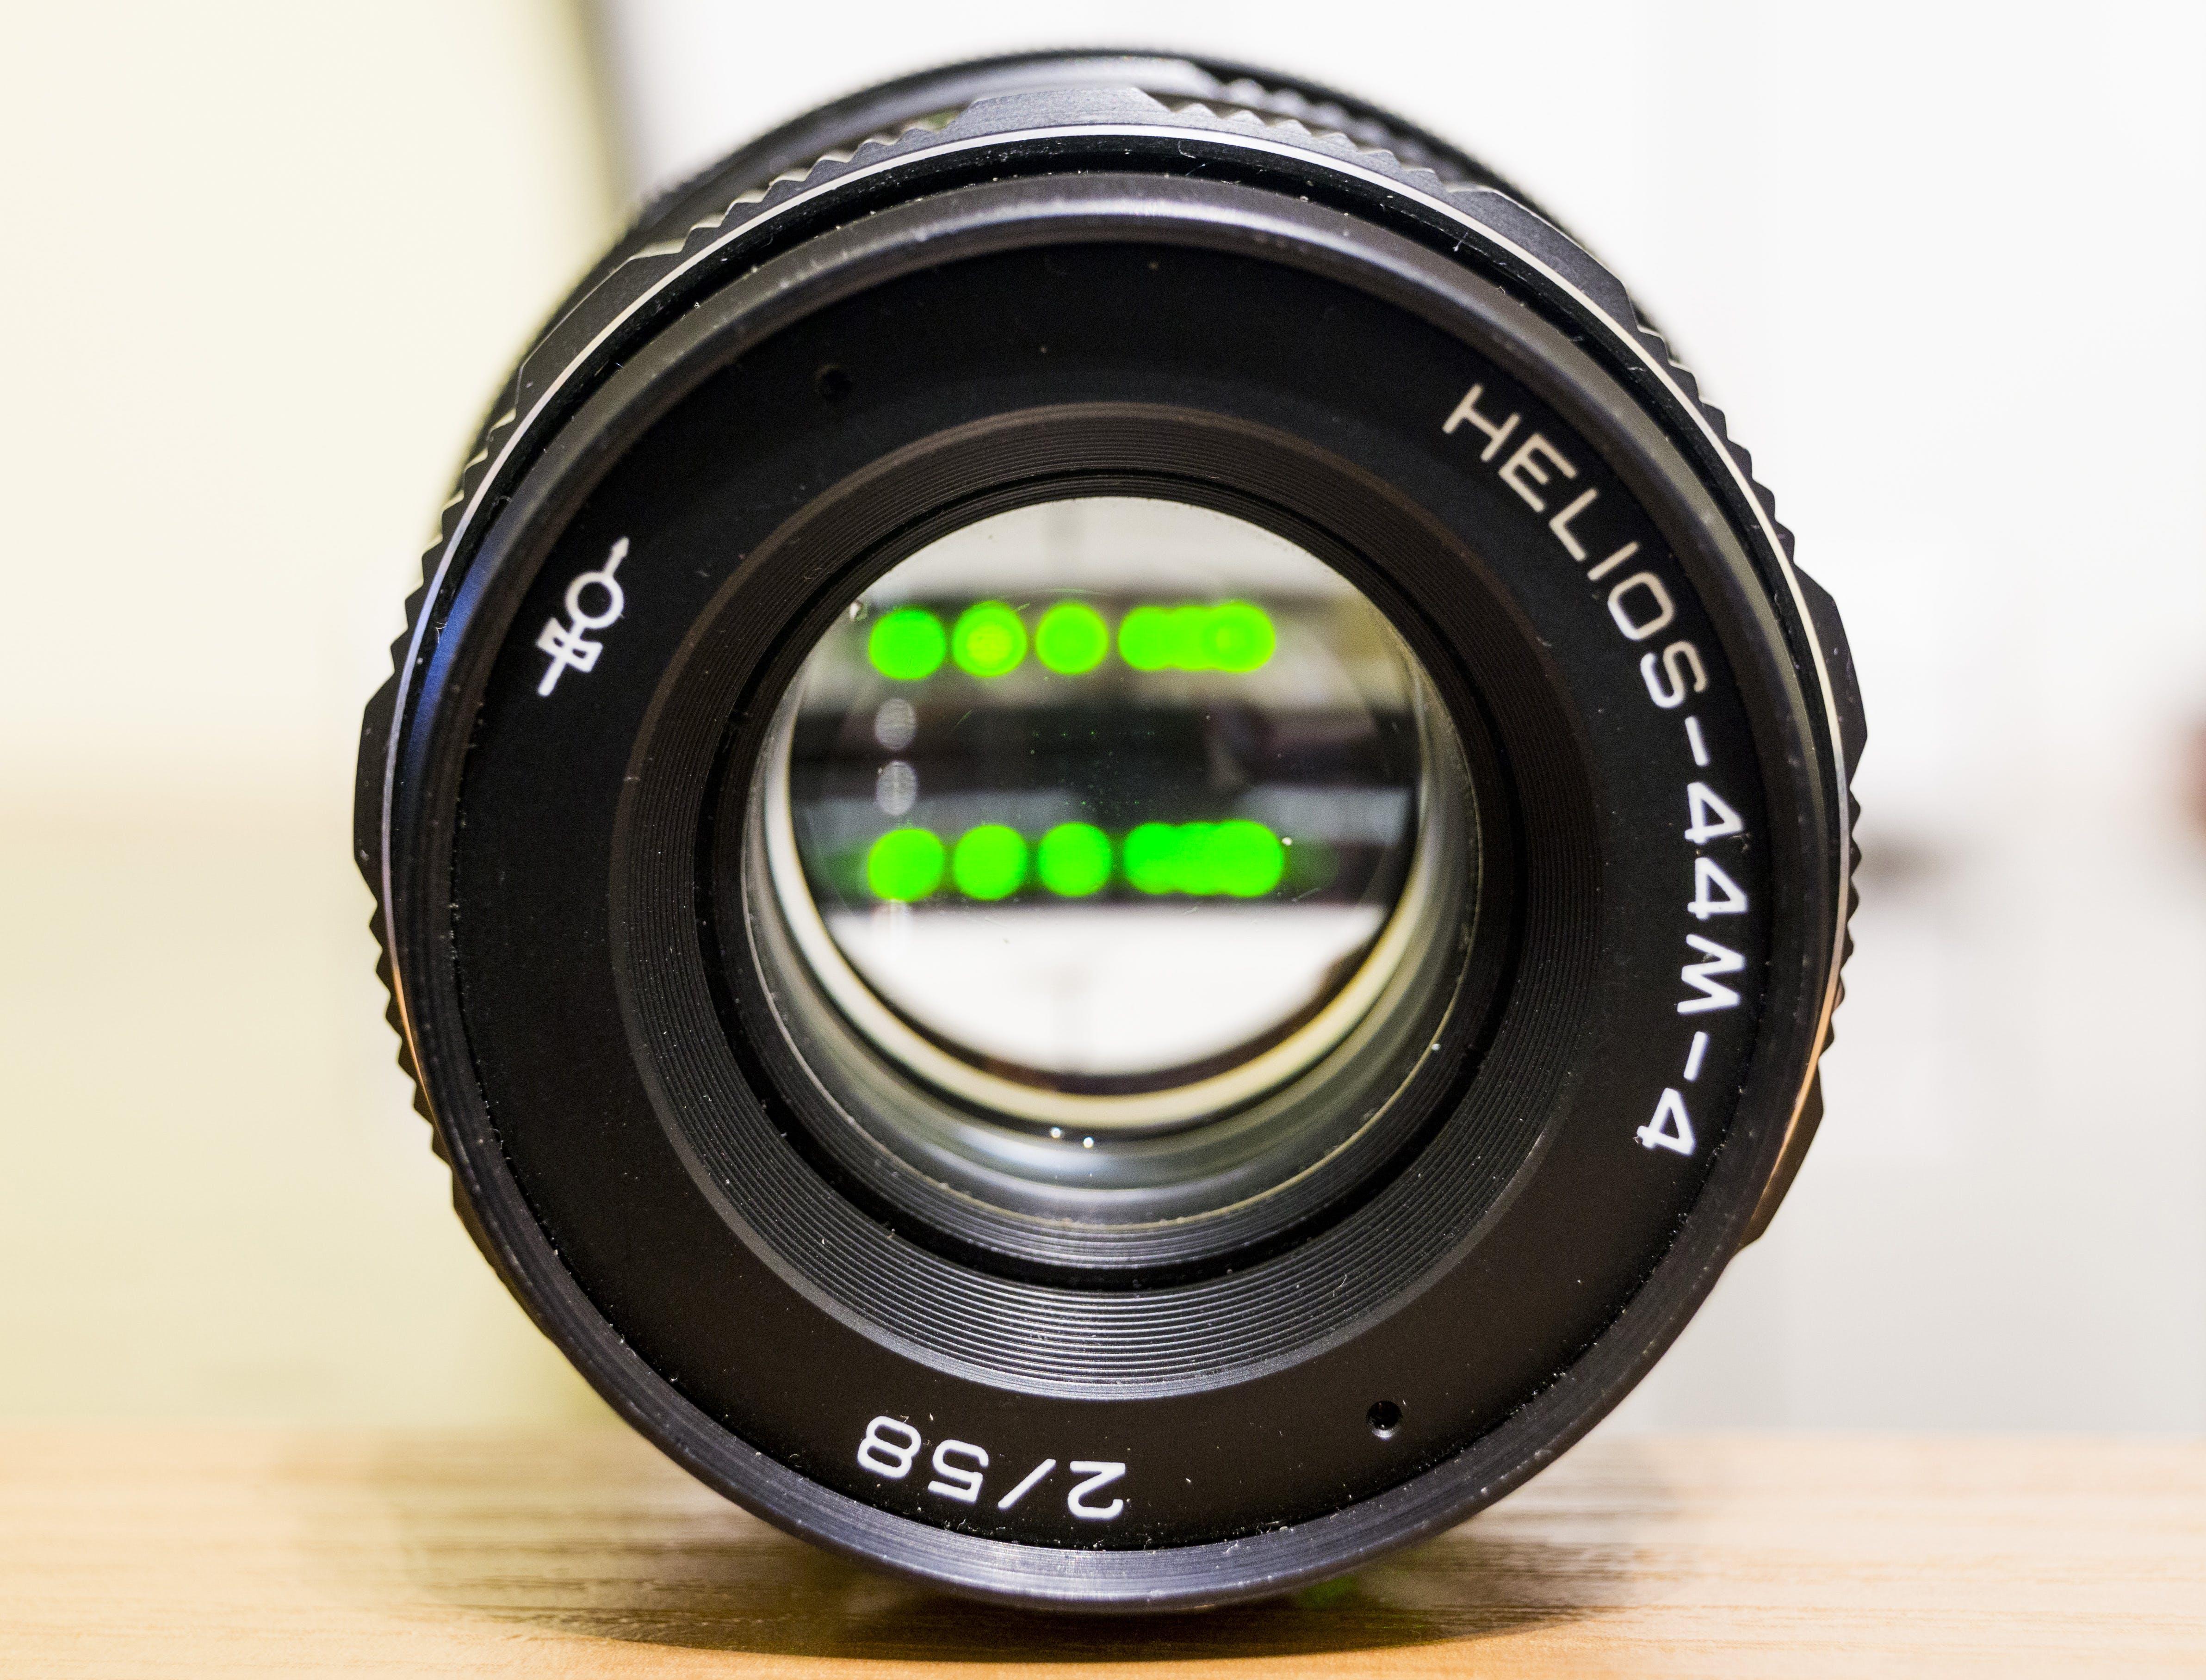 Free stock photo of lens, helios, 44m 4